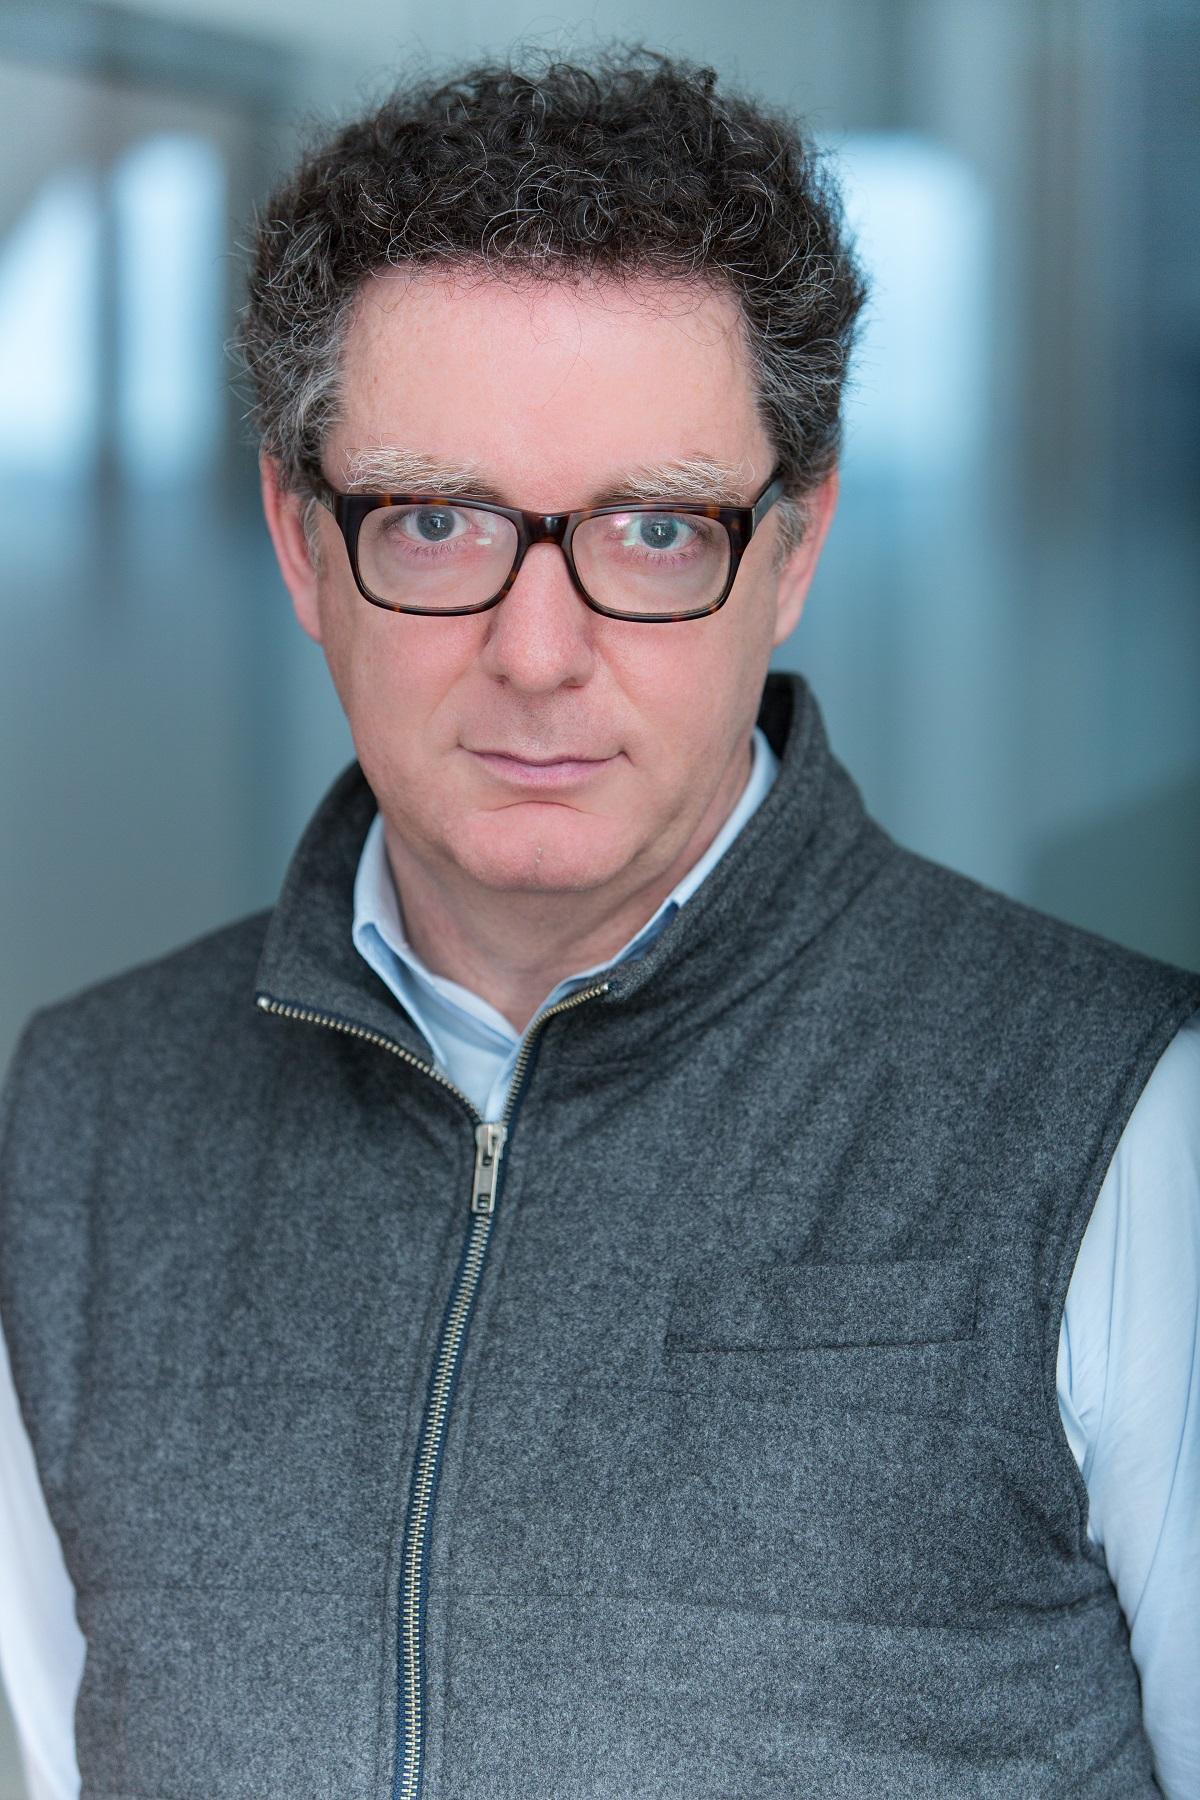 Marc Goldberg  CEO, Maslow Capital Partners